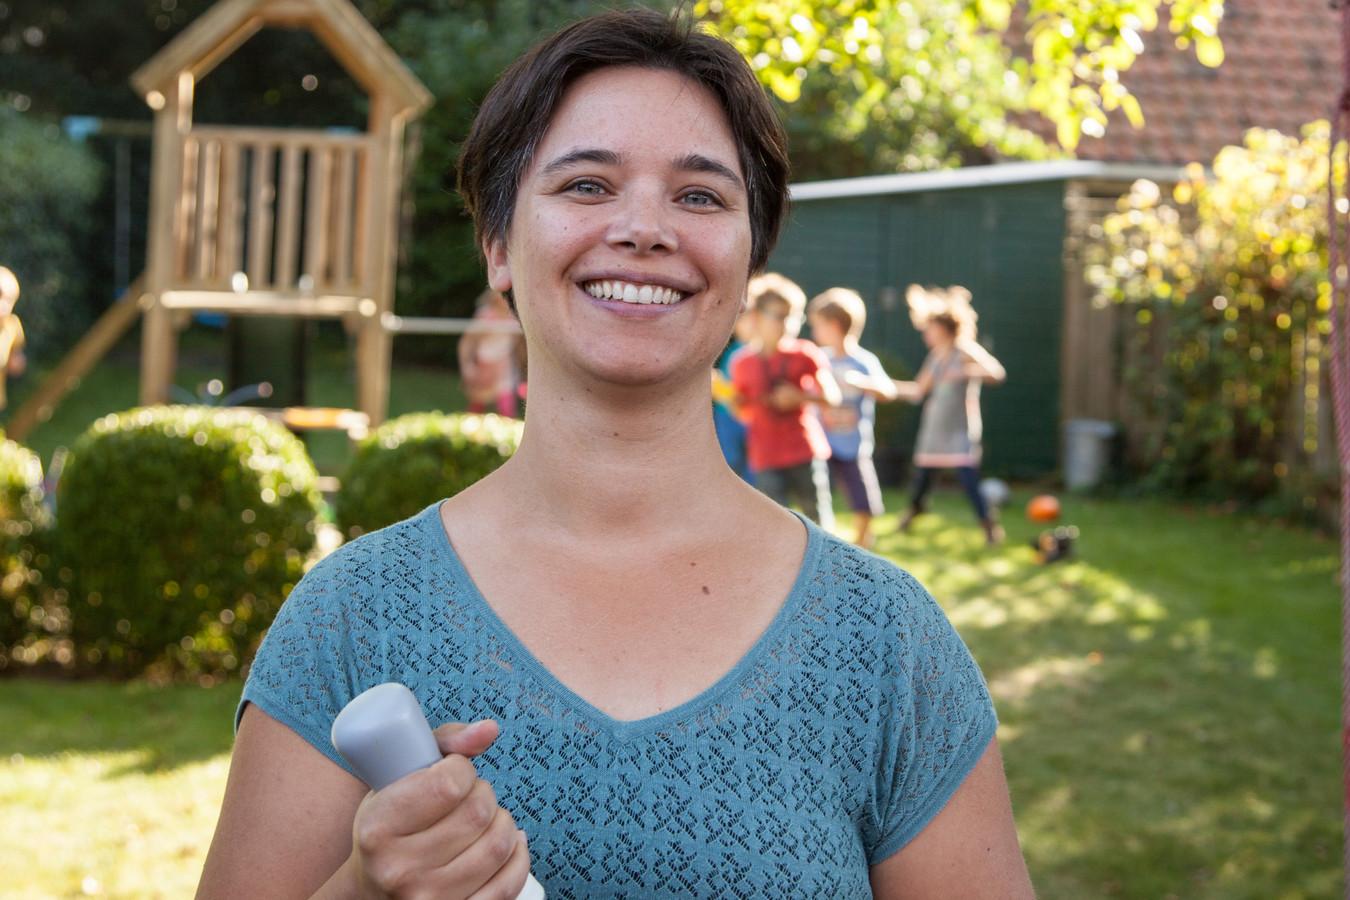 Iris Stoute, mede-oprichter van buitenspel gameconsole Picoo